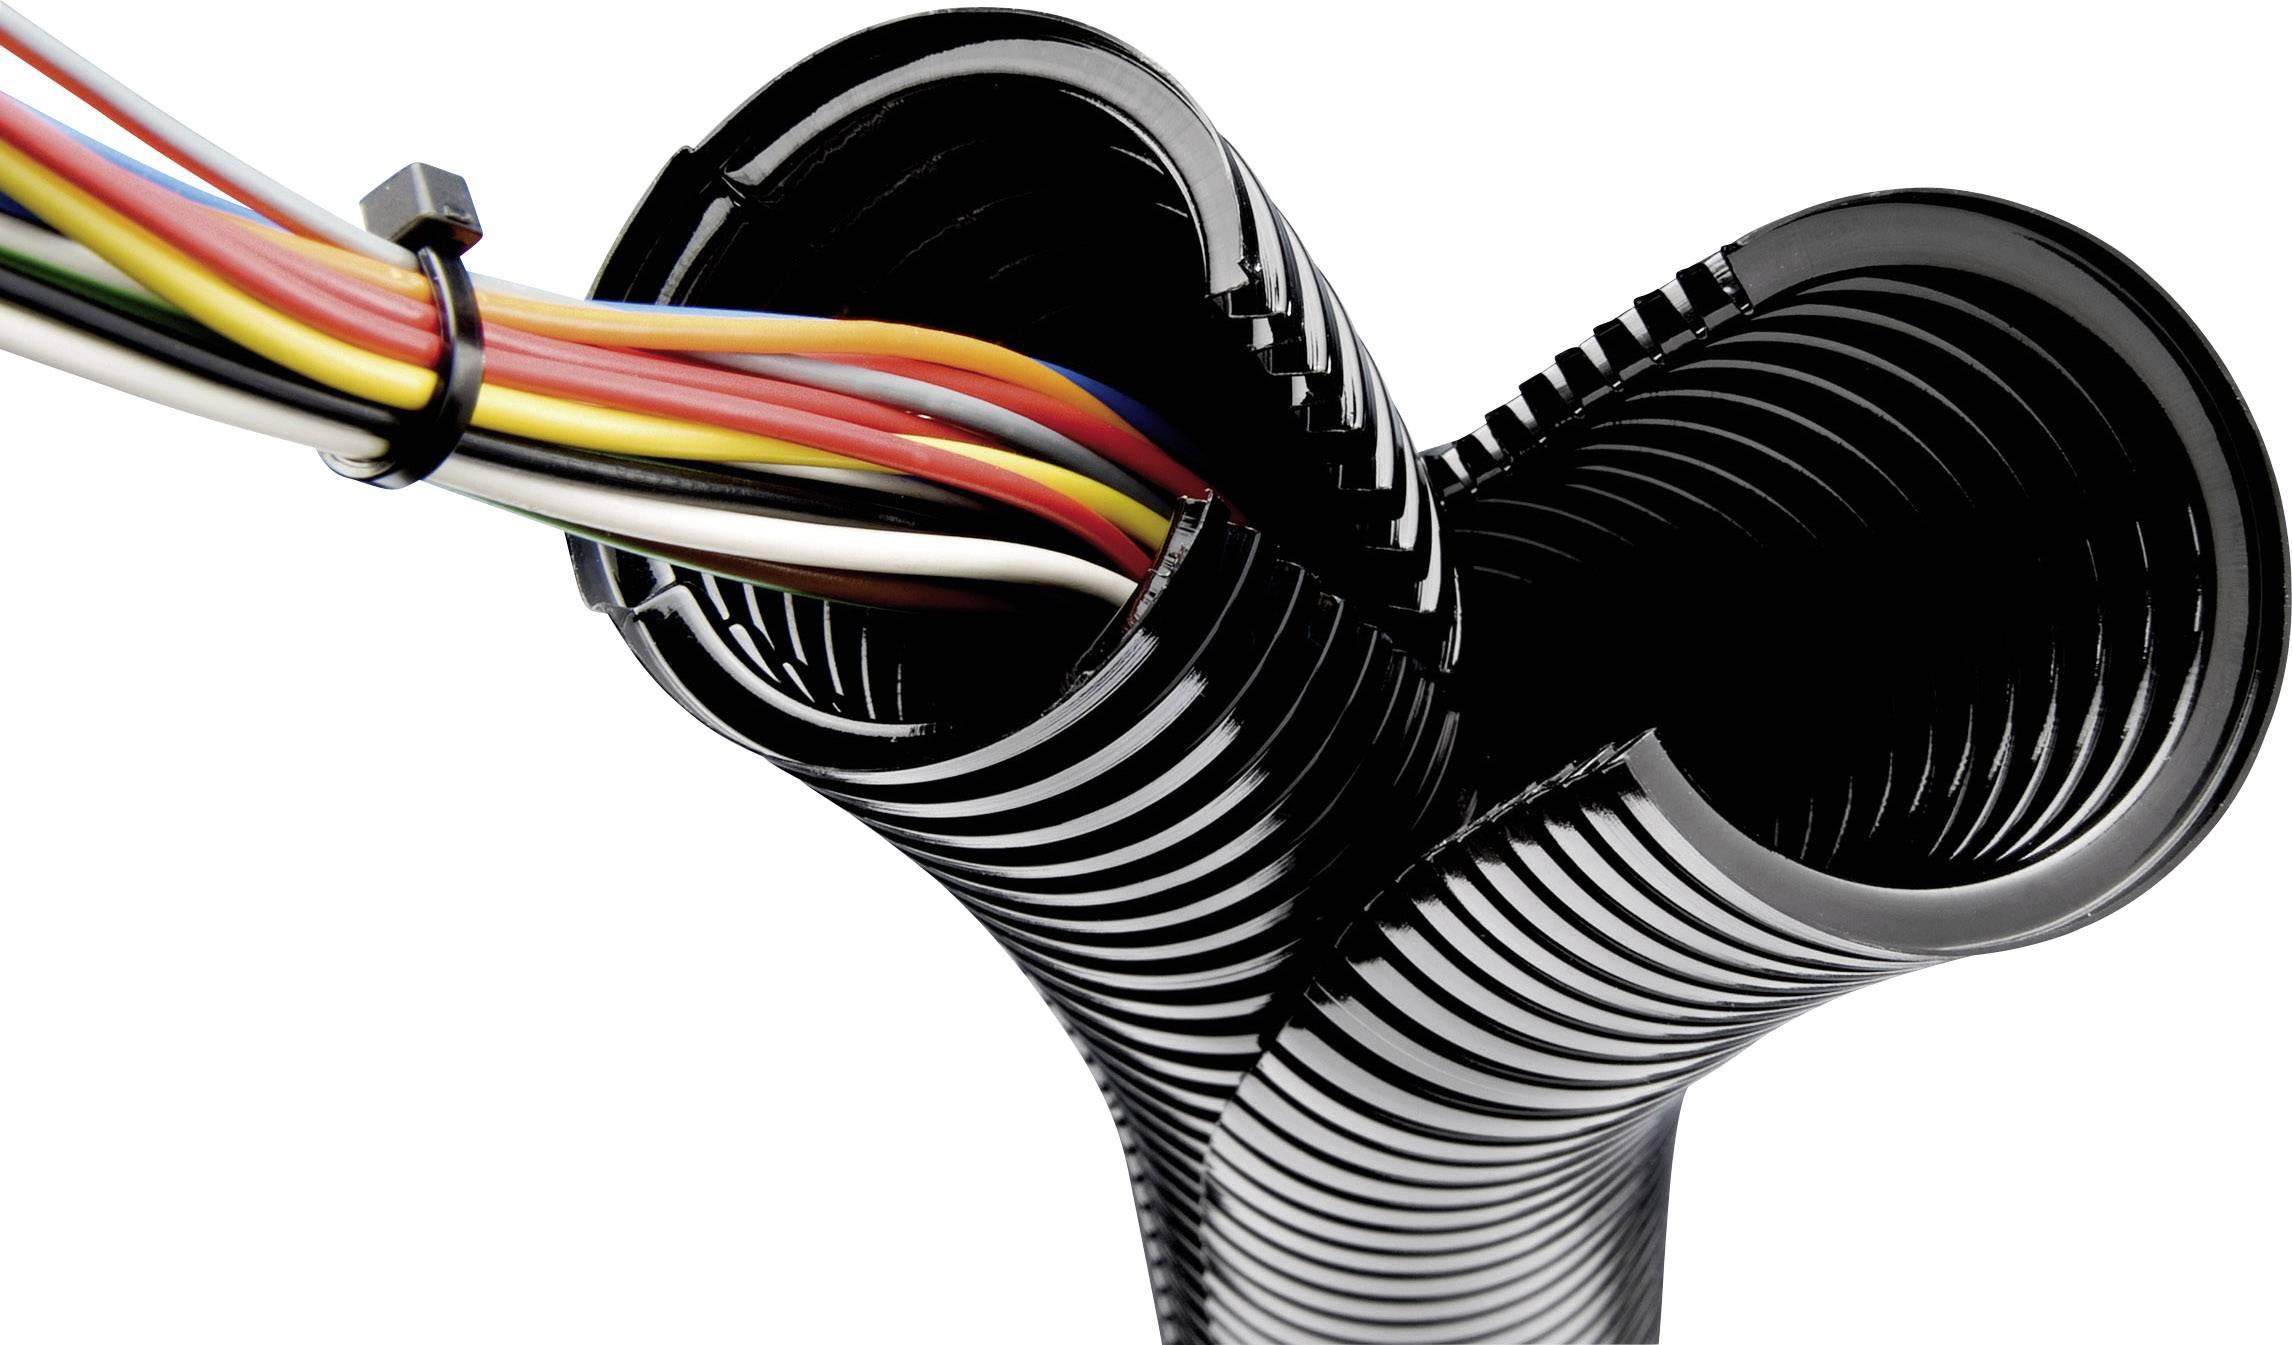 Ochranná hadica na káble rovná LappKabel SILVYN® SPLIT 10 61806620, 8.90 mm, čierna, metrový tovar